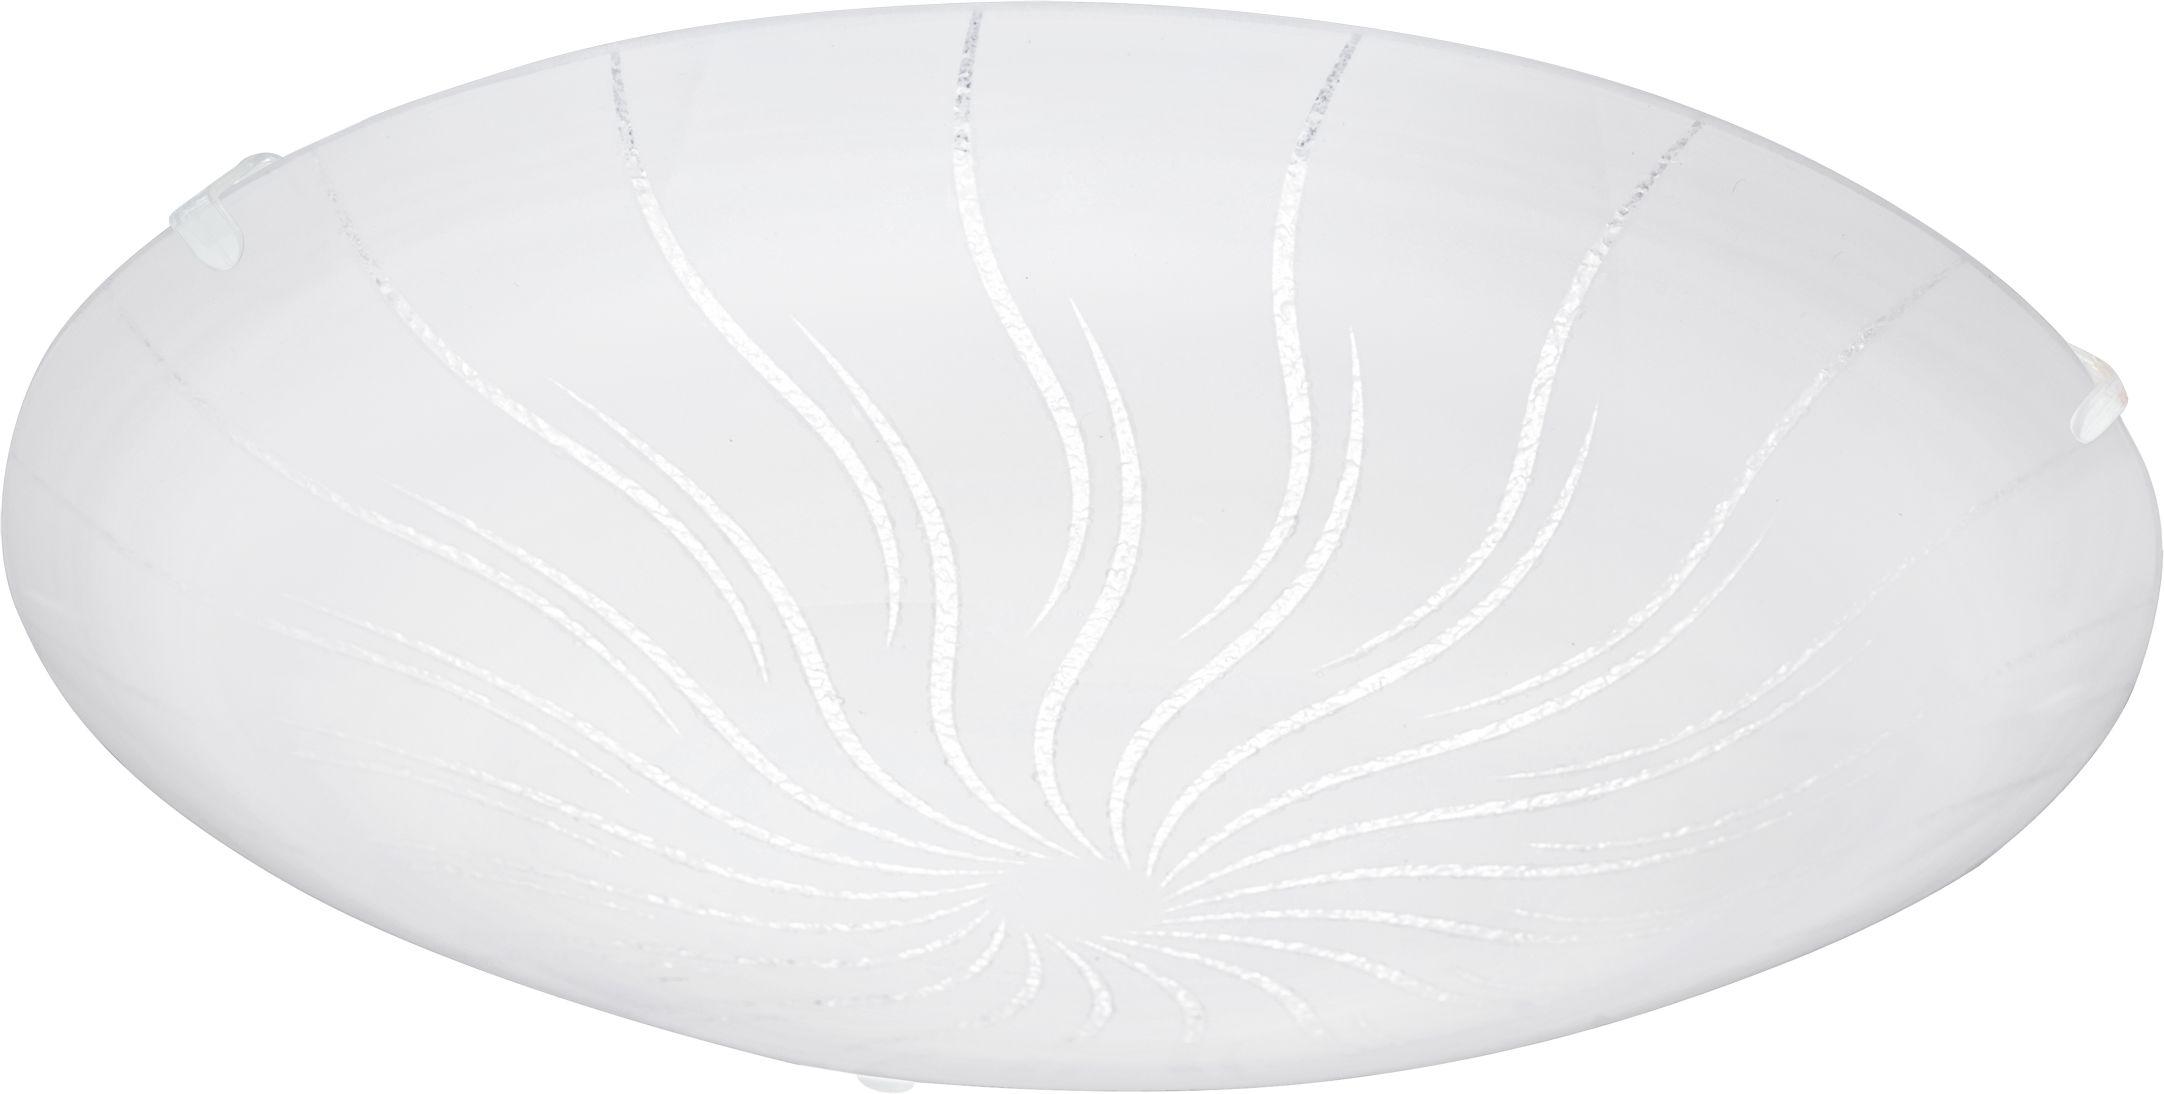 Eglo plafon LED Margitta 1 96111 - SUPER OFERTA - RABAT w koszyku